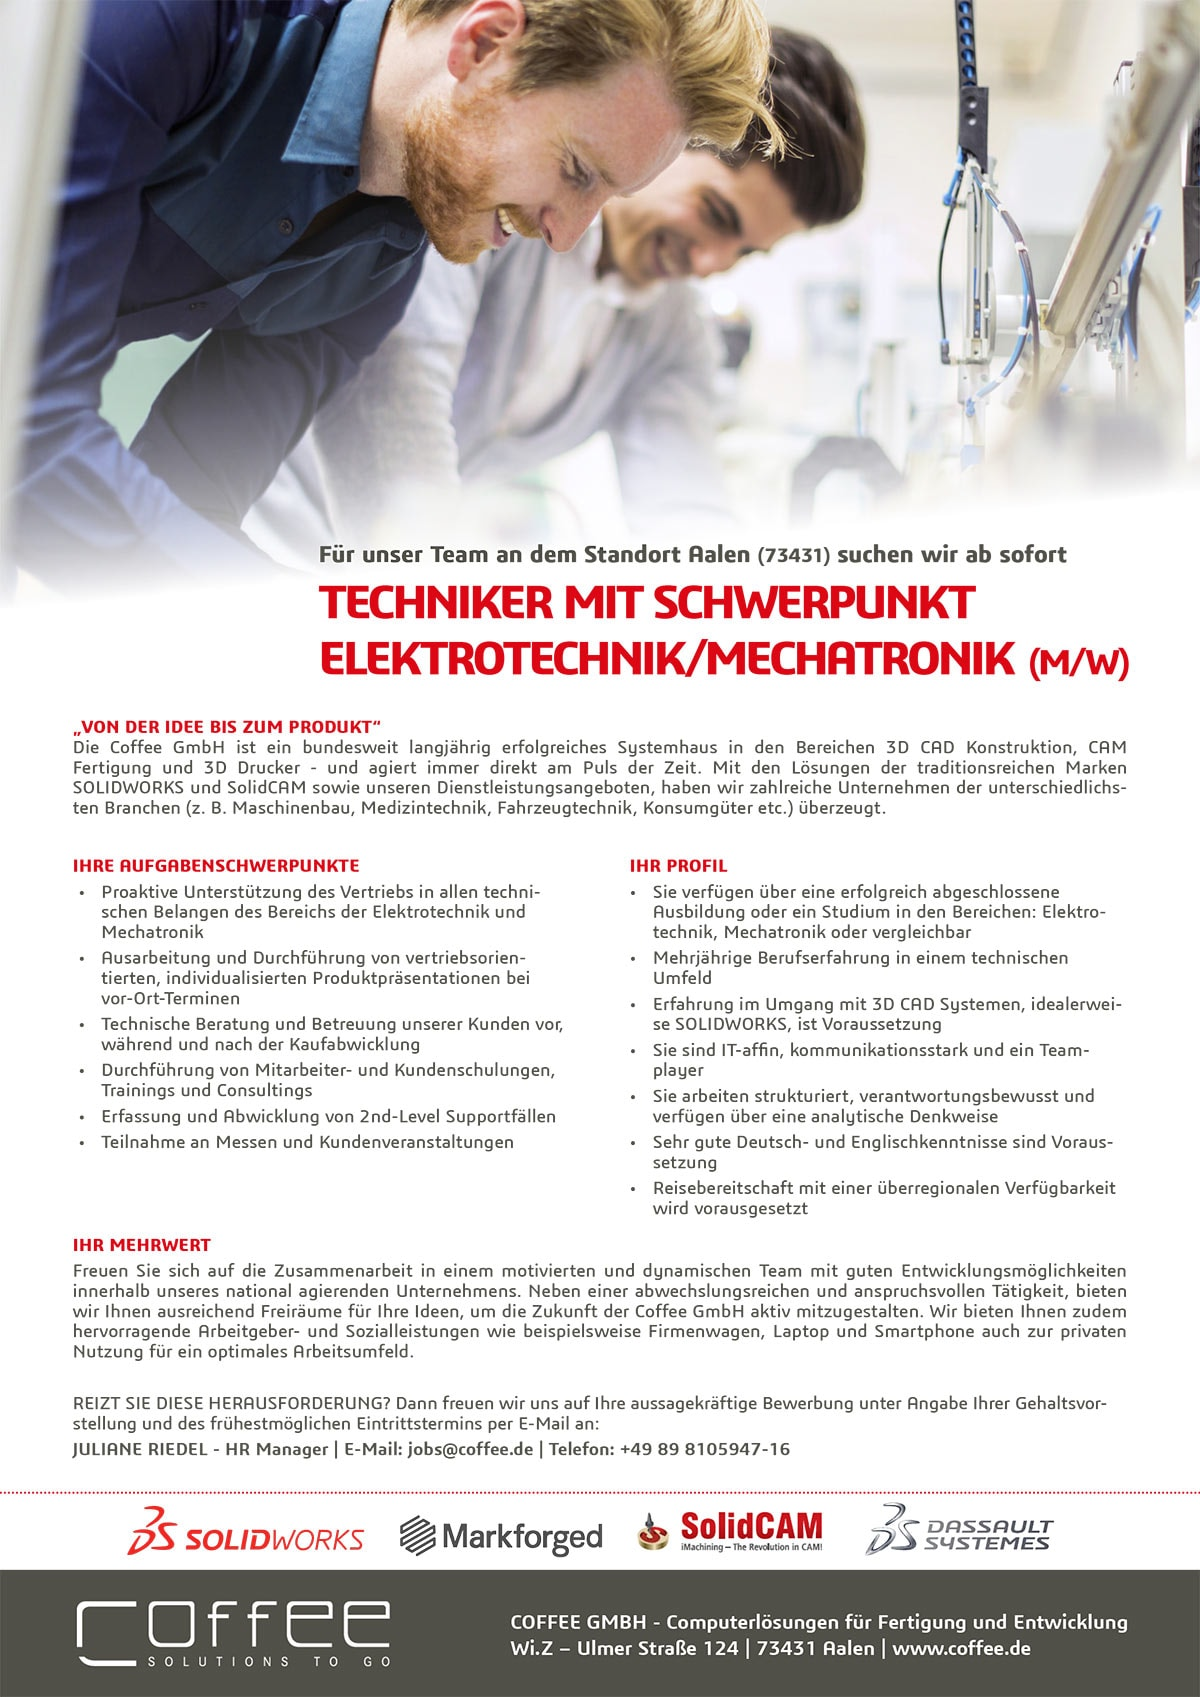 Stellenanzeige_Techniker-Electrical_0716_Aalen